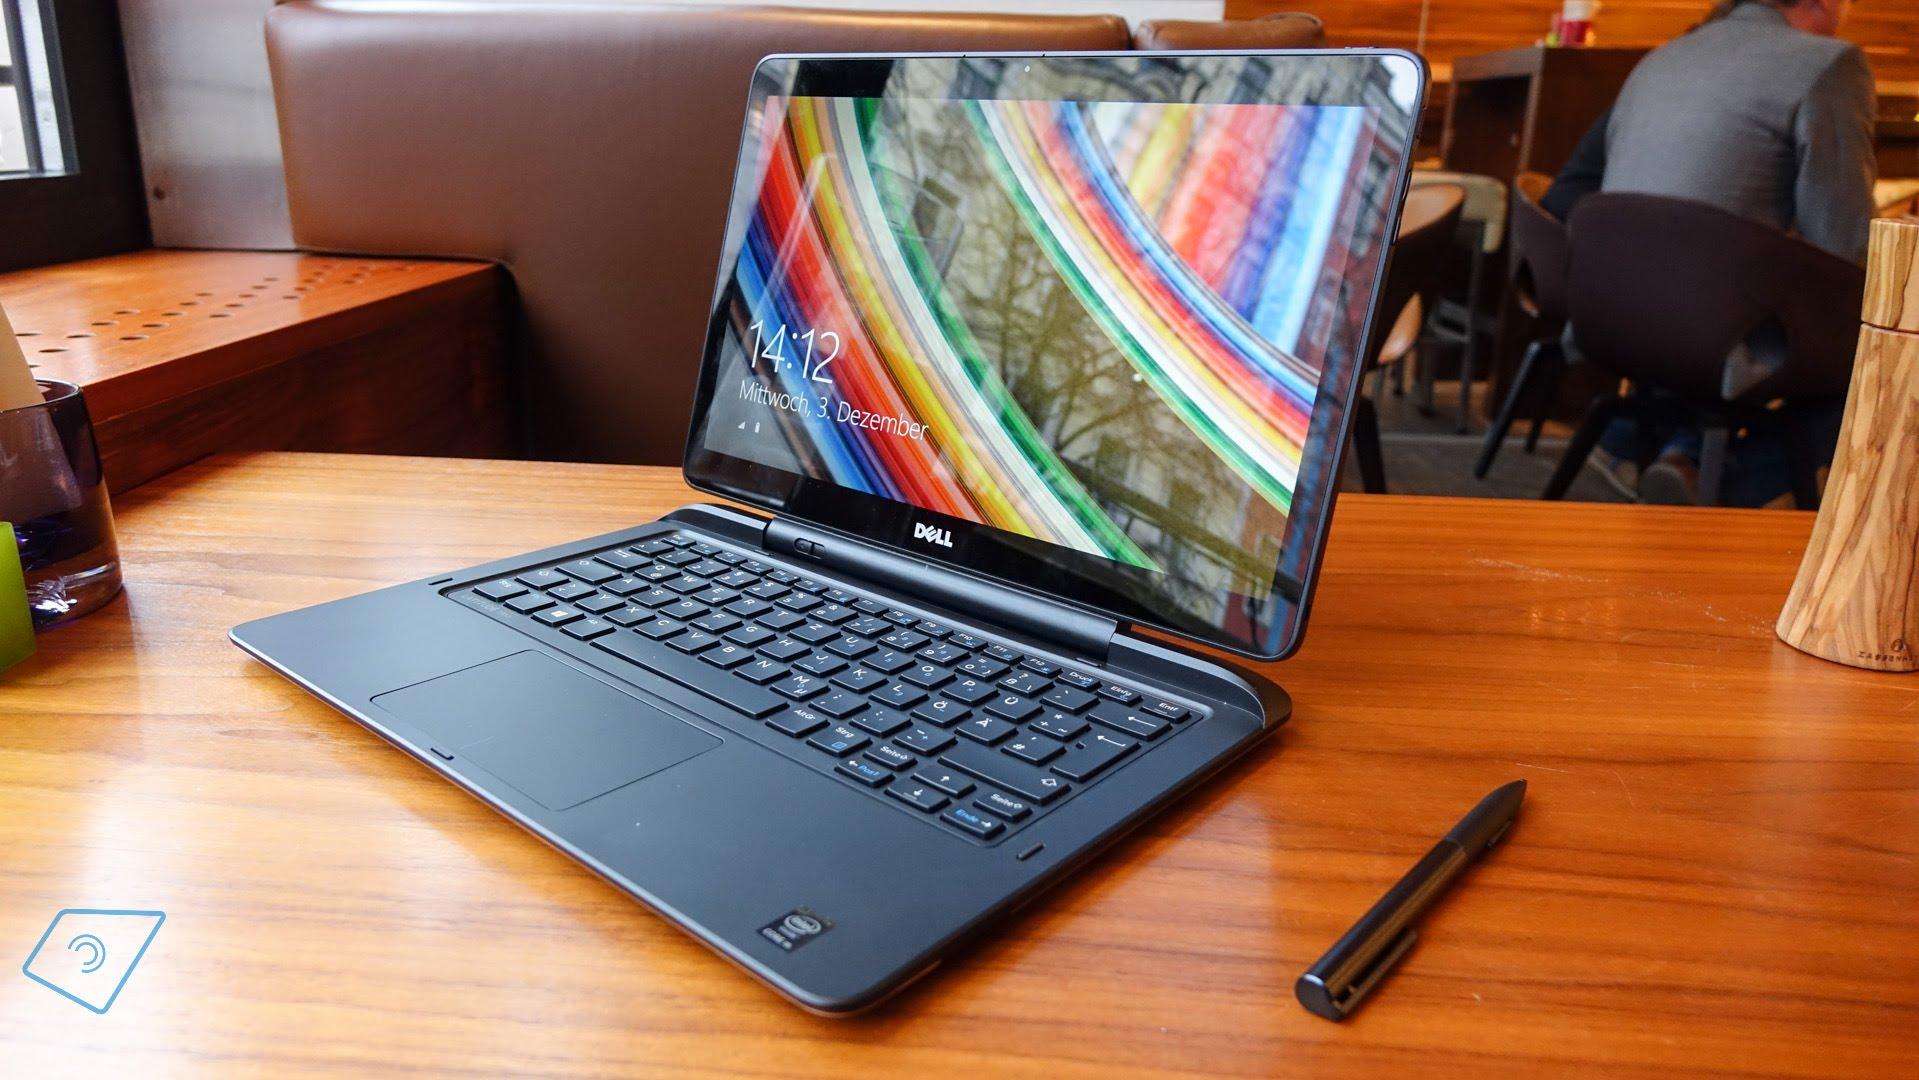 Dell Latitude 13 7000 – lightweight laptop